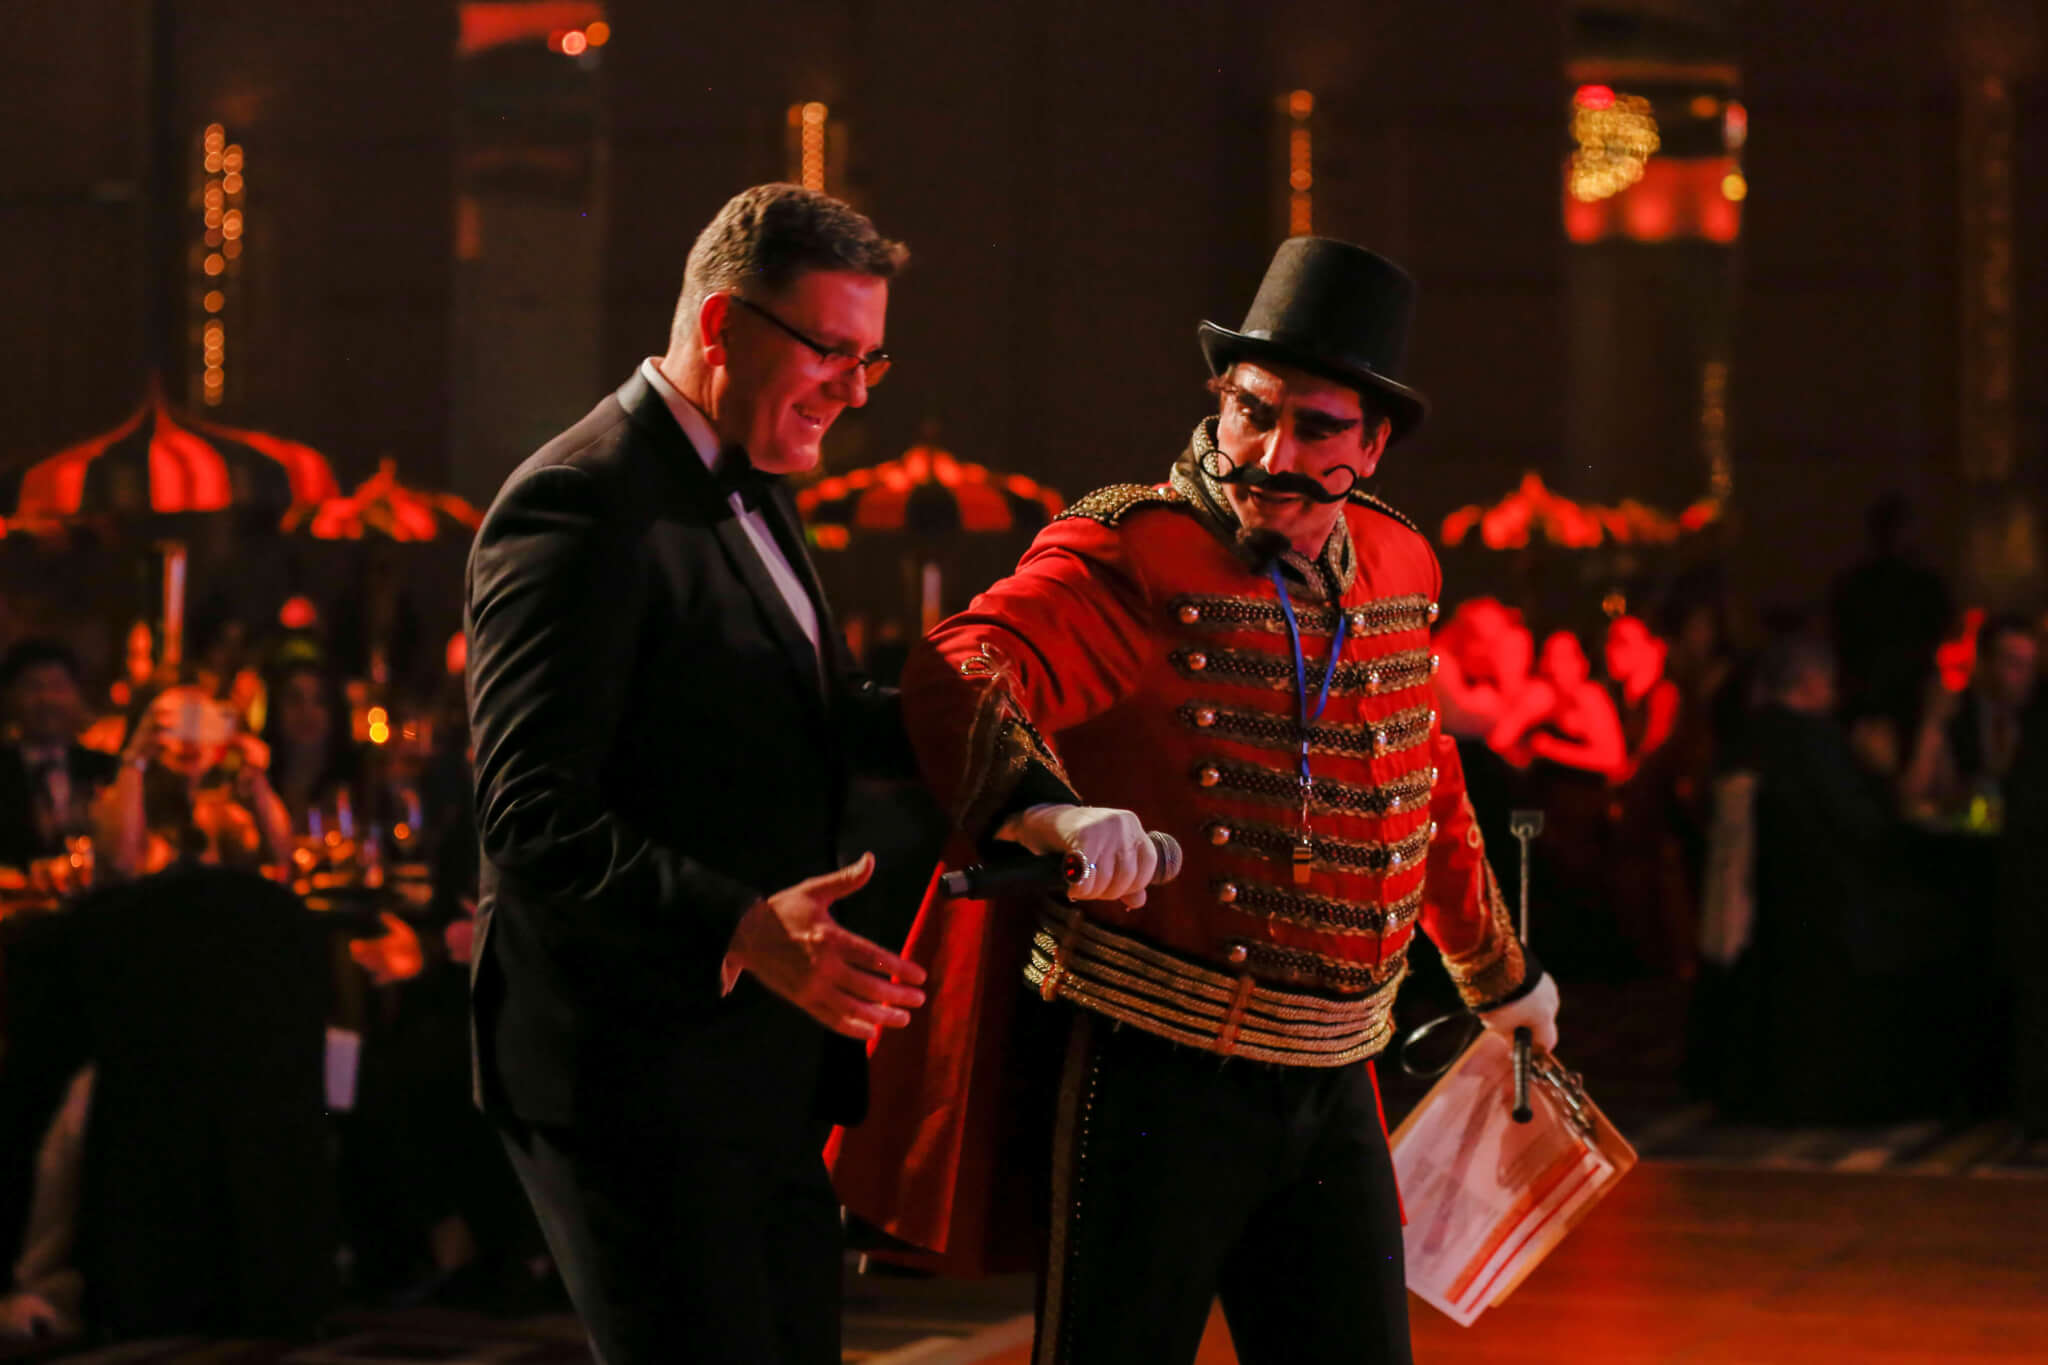 Ringmaster Zigler | Vintage Circus Event Theme